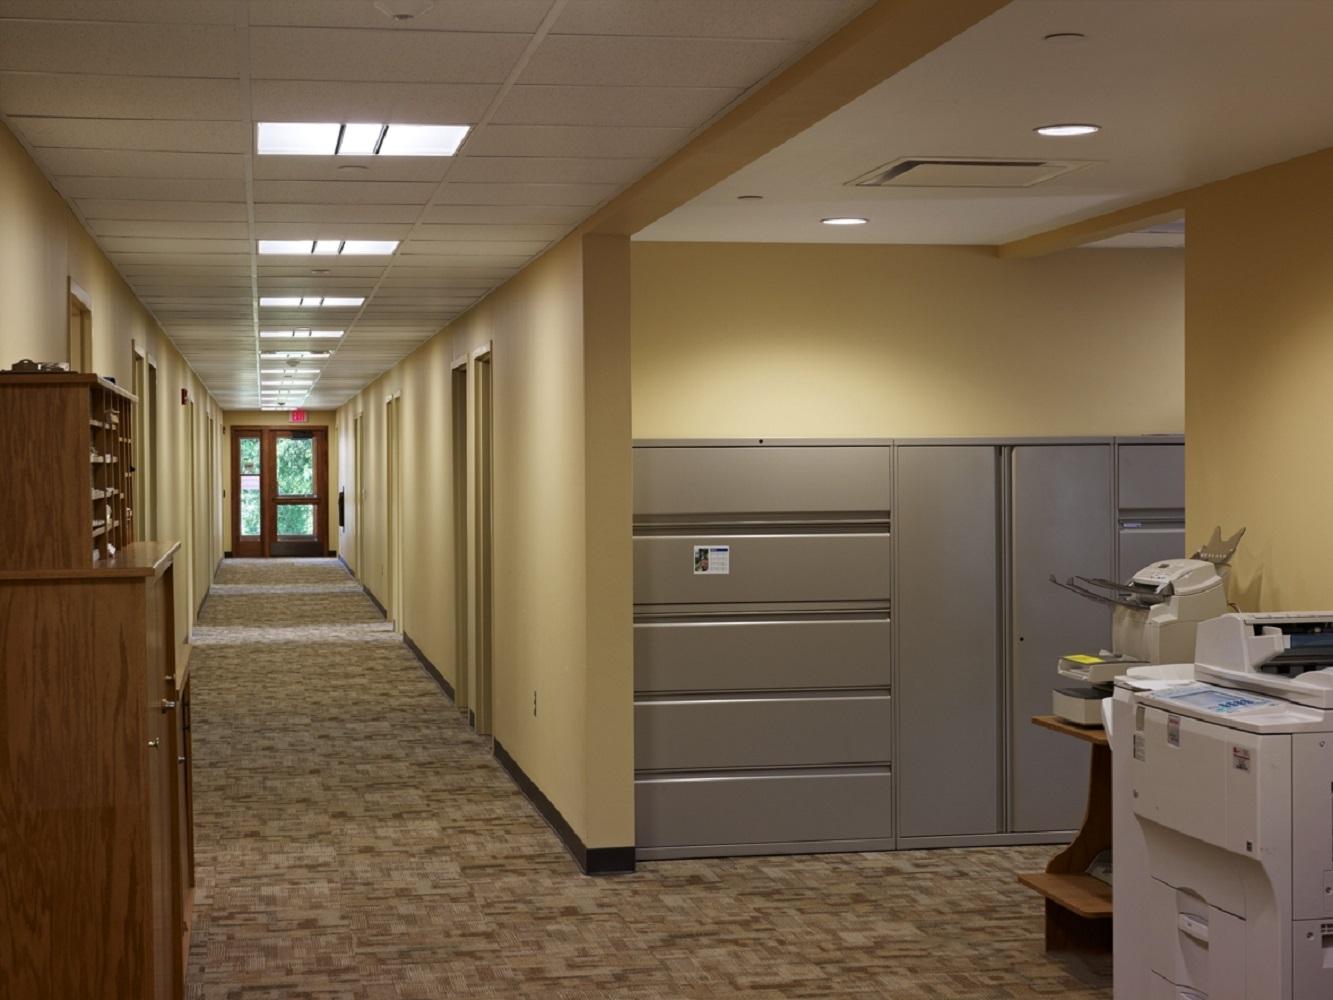 Interior Corridor.jpg